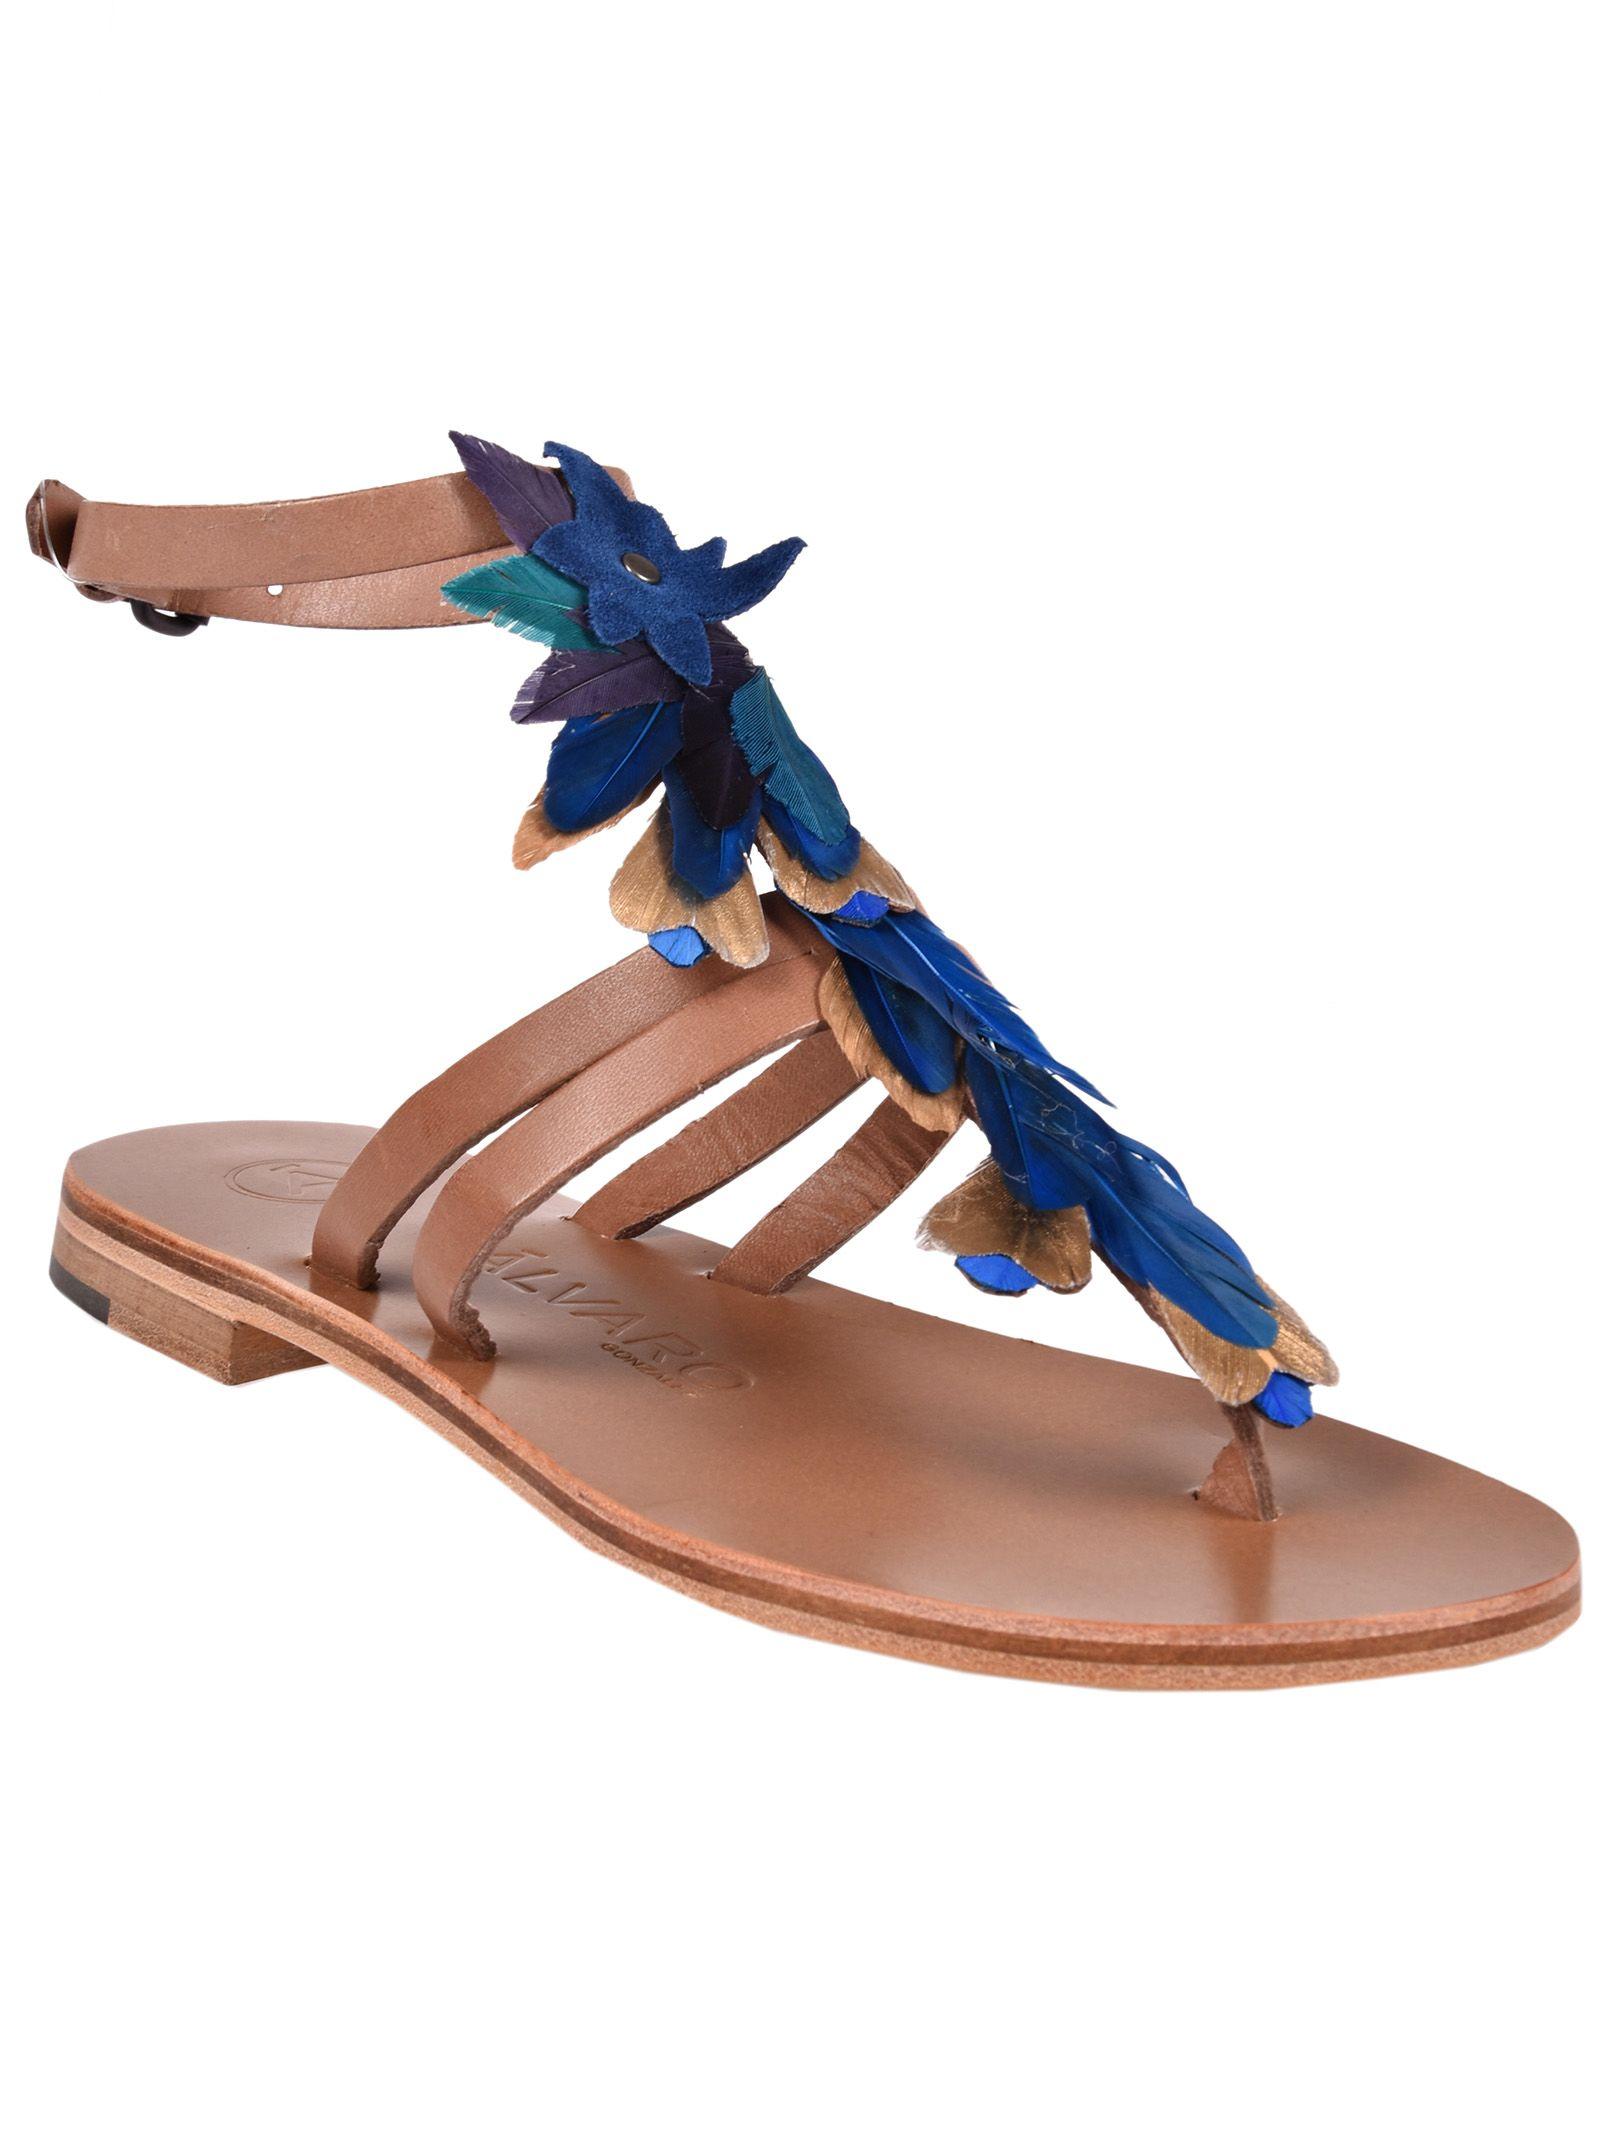 Cheap Sale With Mastercard álvaro álvaro Ariana Flat Sandals Cheap Recommend 3mOcWY7